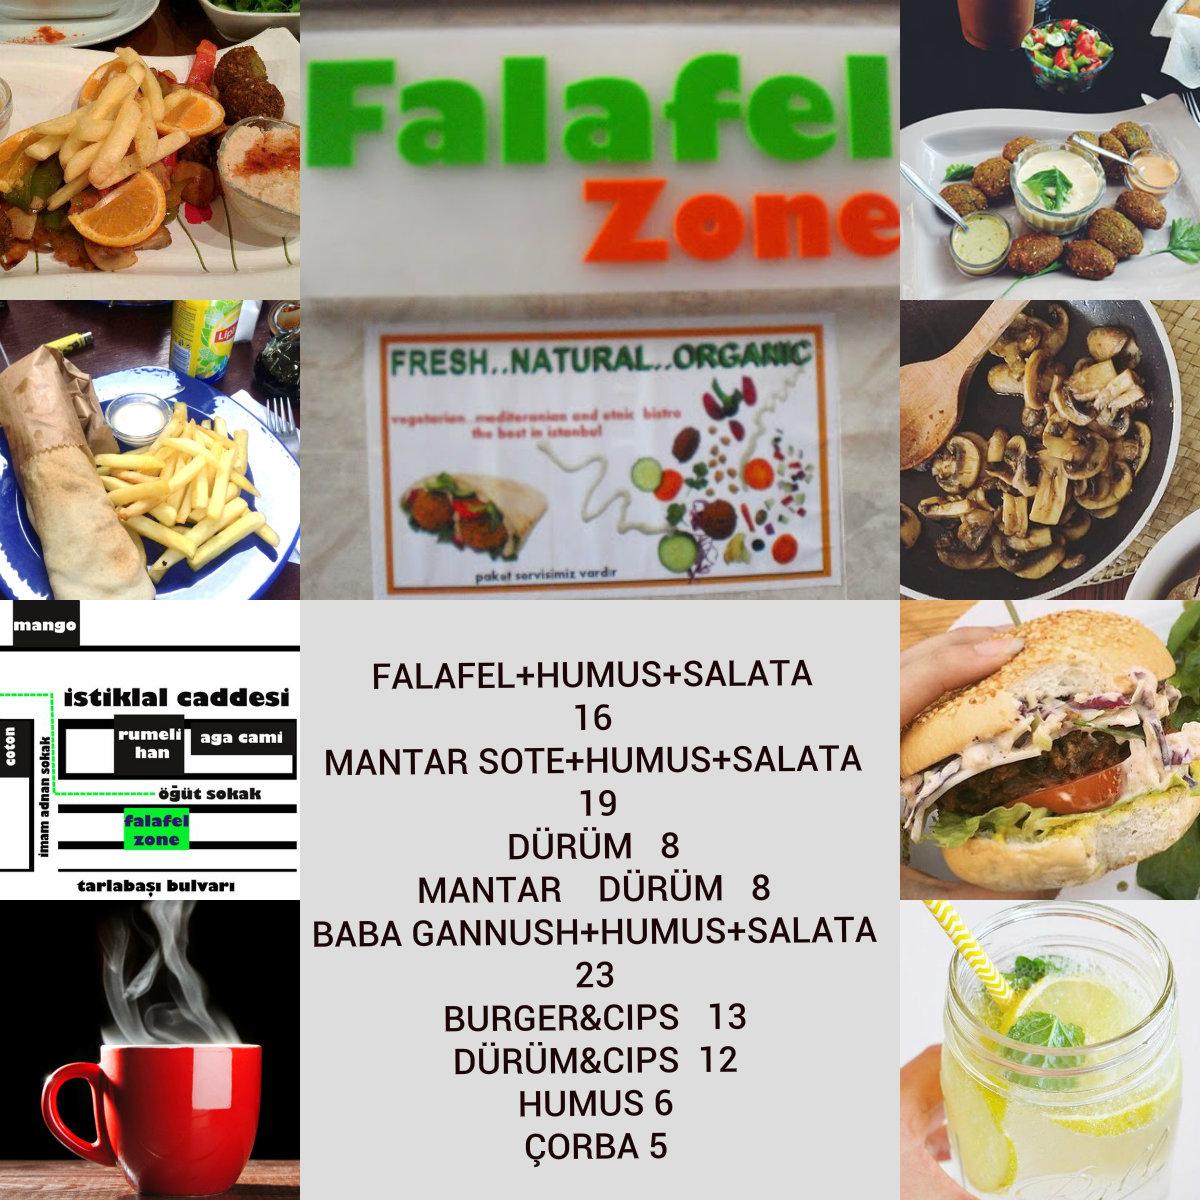 falafelzone...best fresh food in town